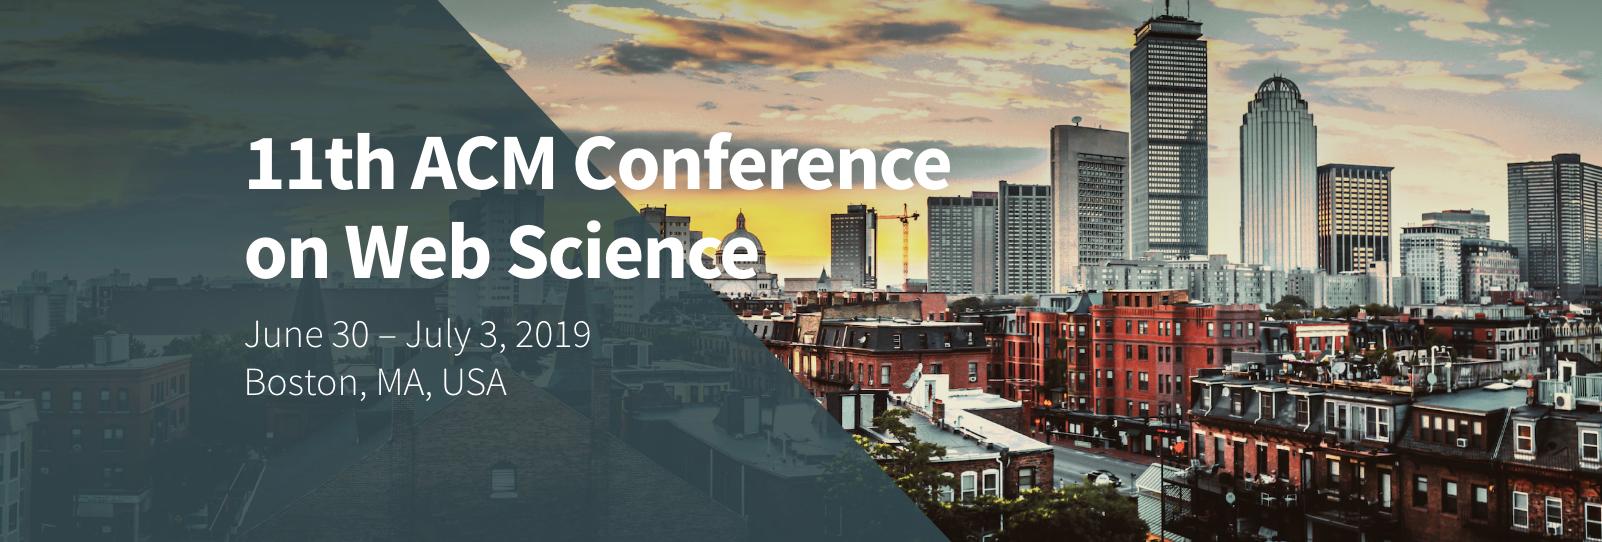 ACM WebSci 2019